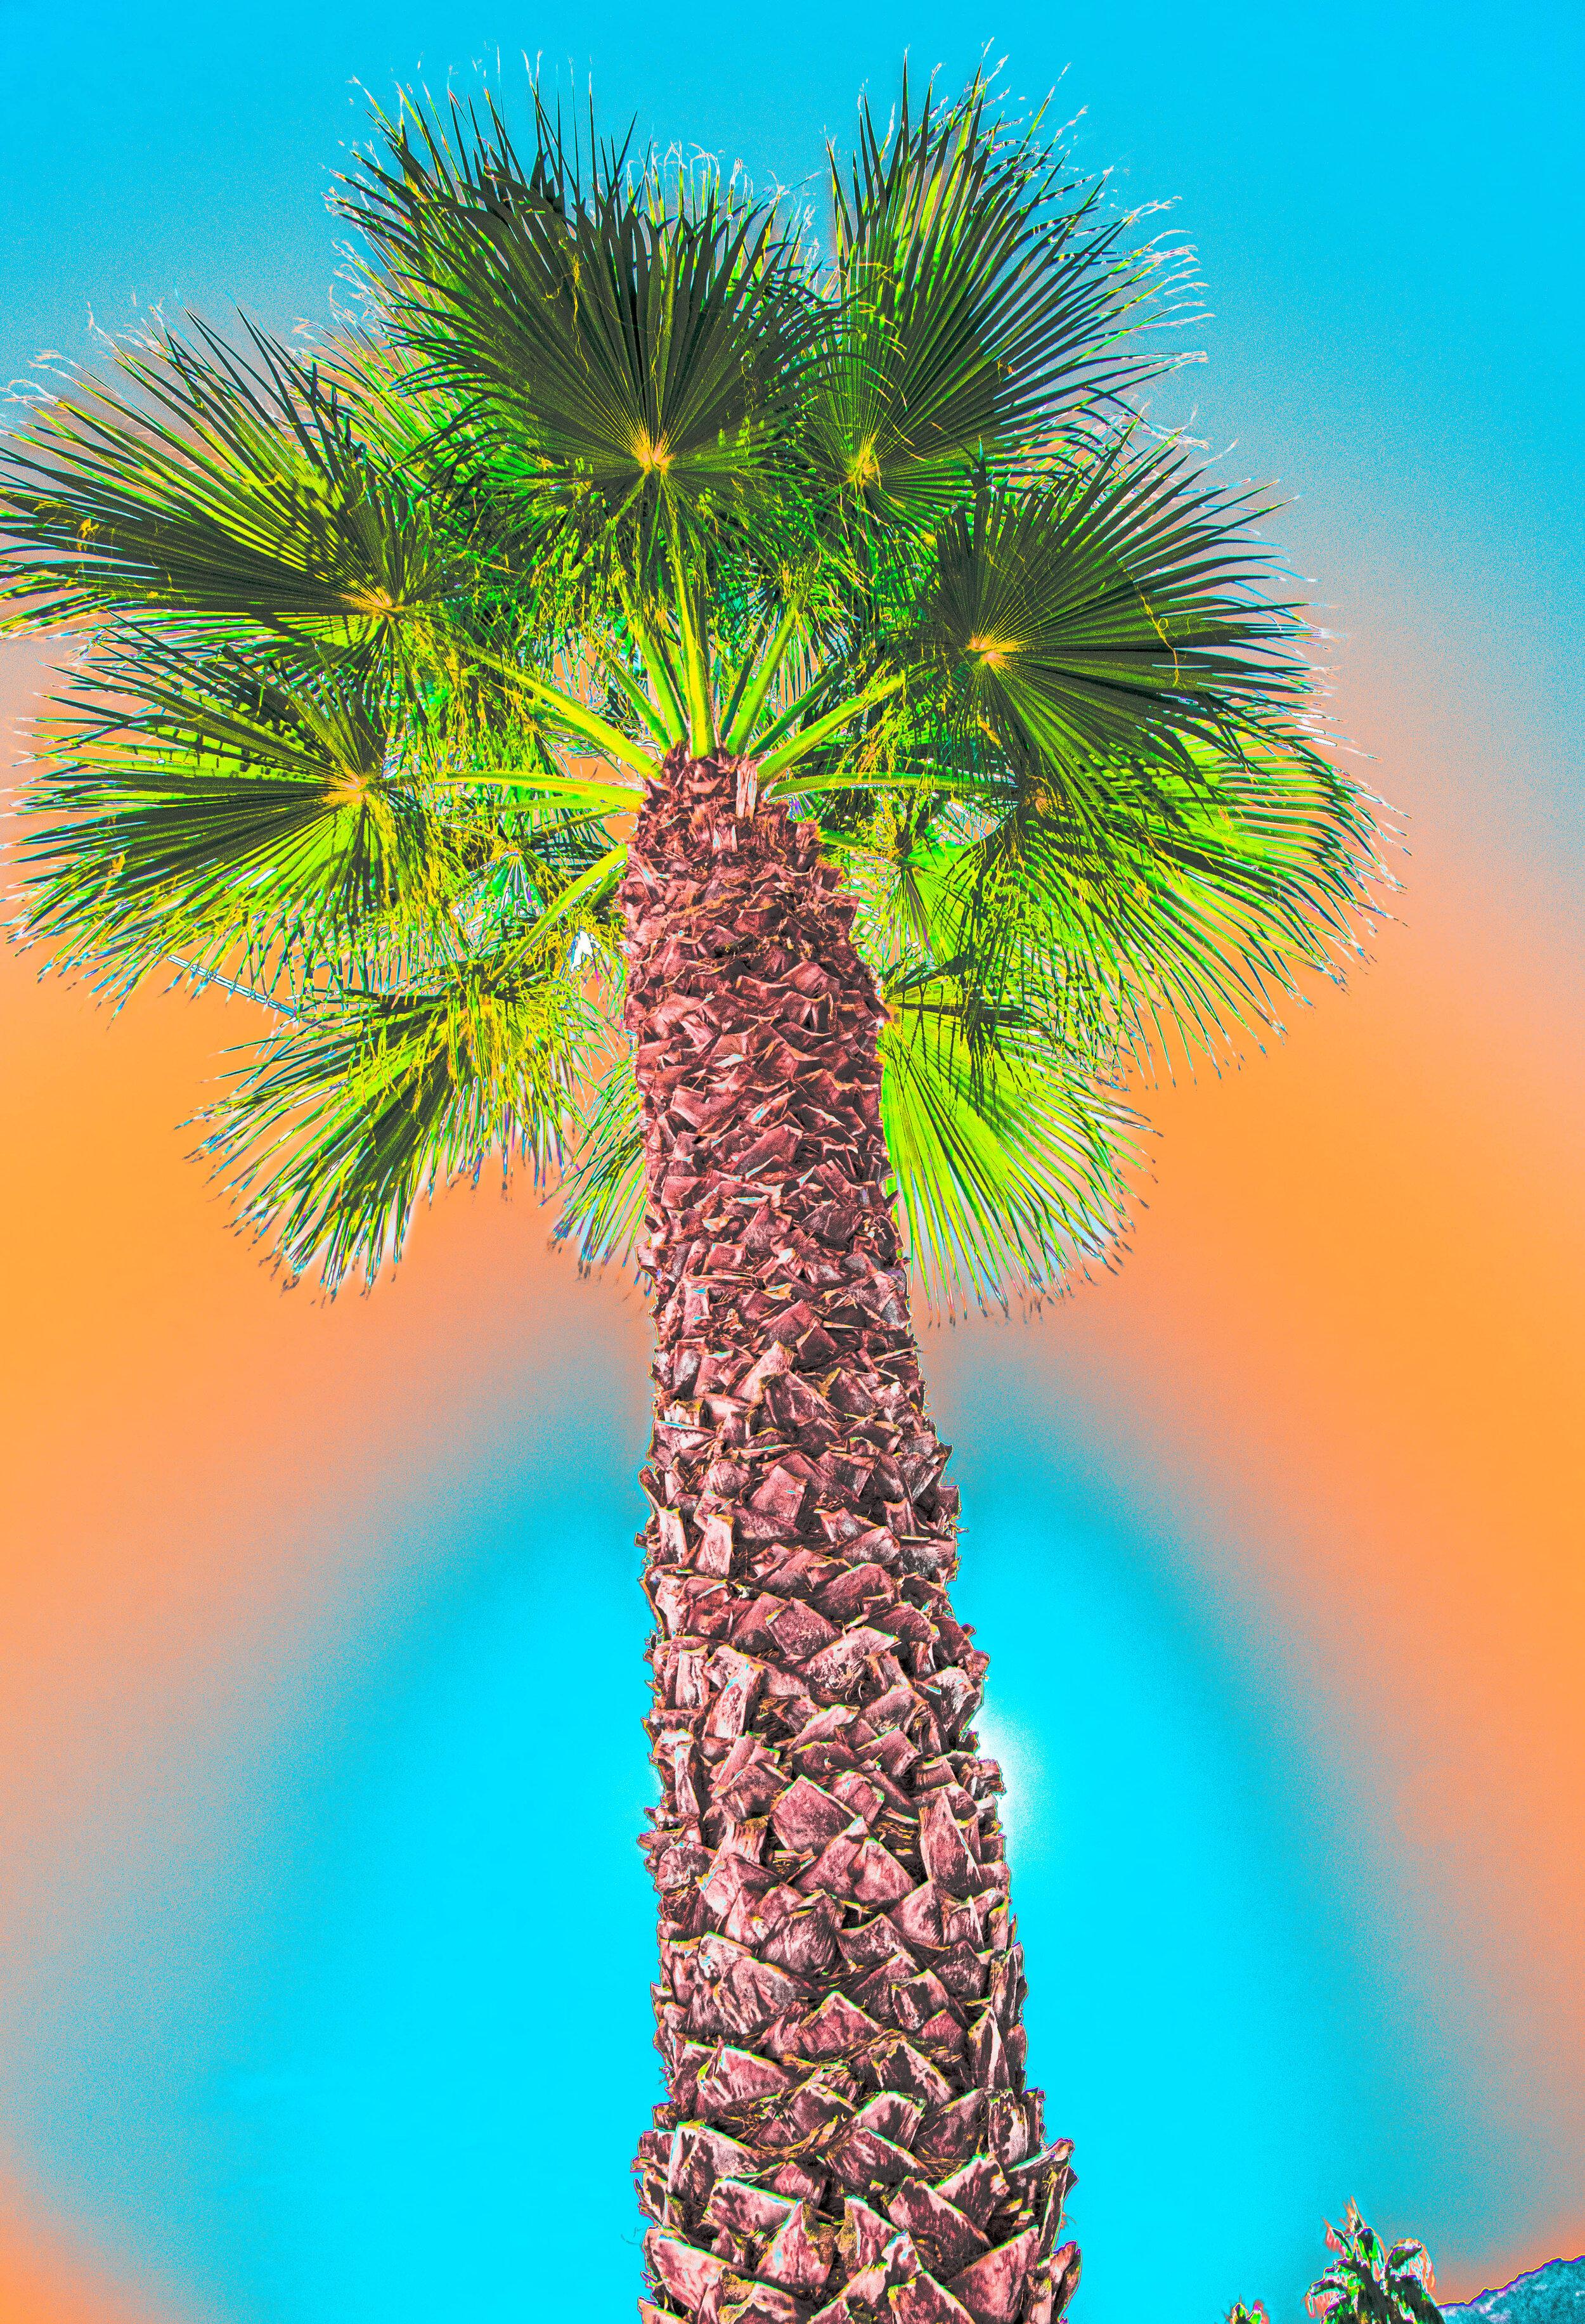 Tall Palm Orange/Blue Sky